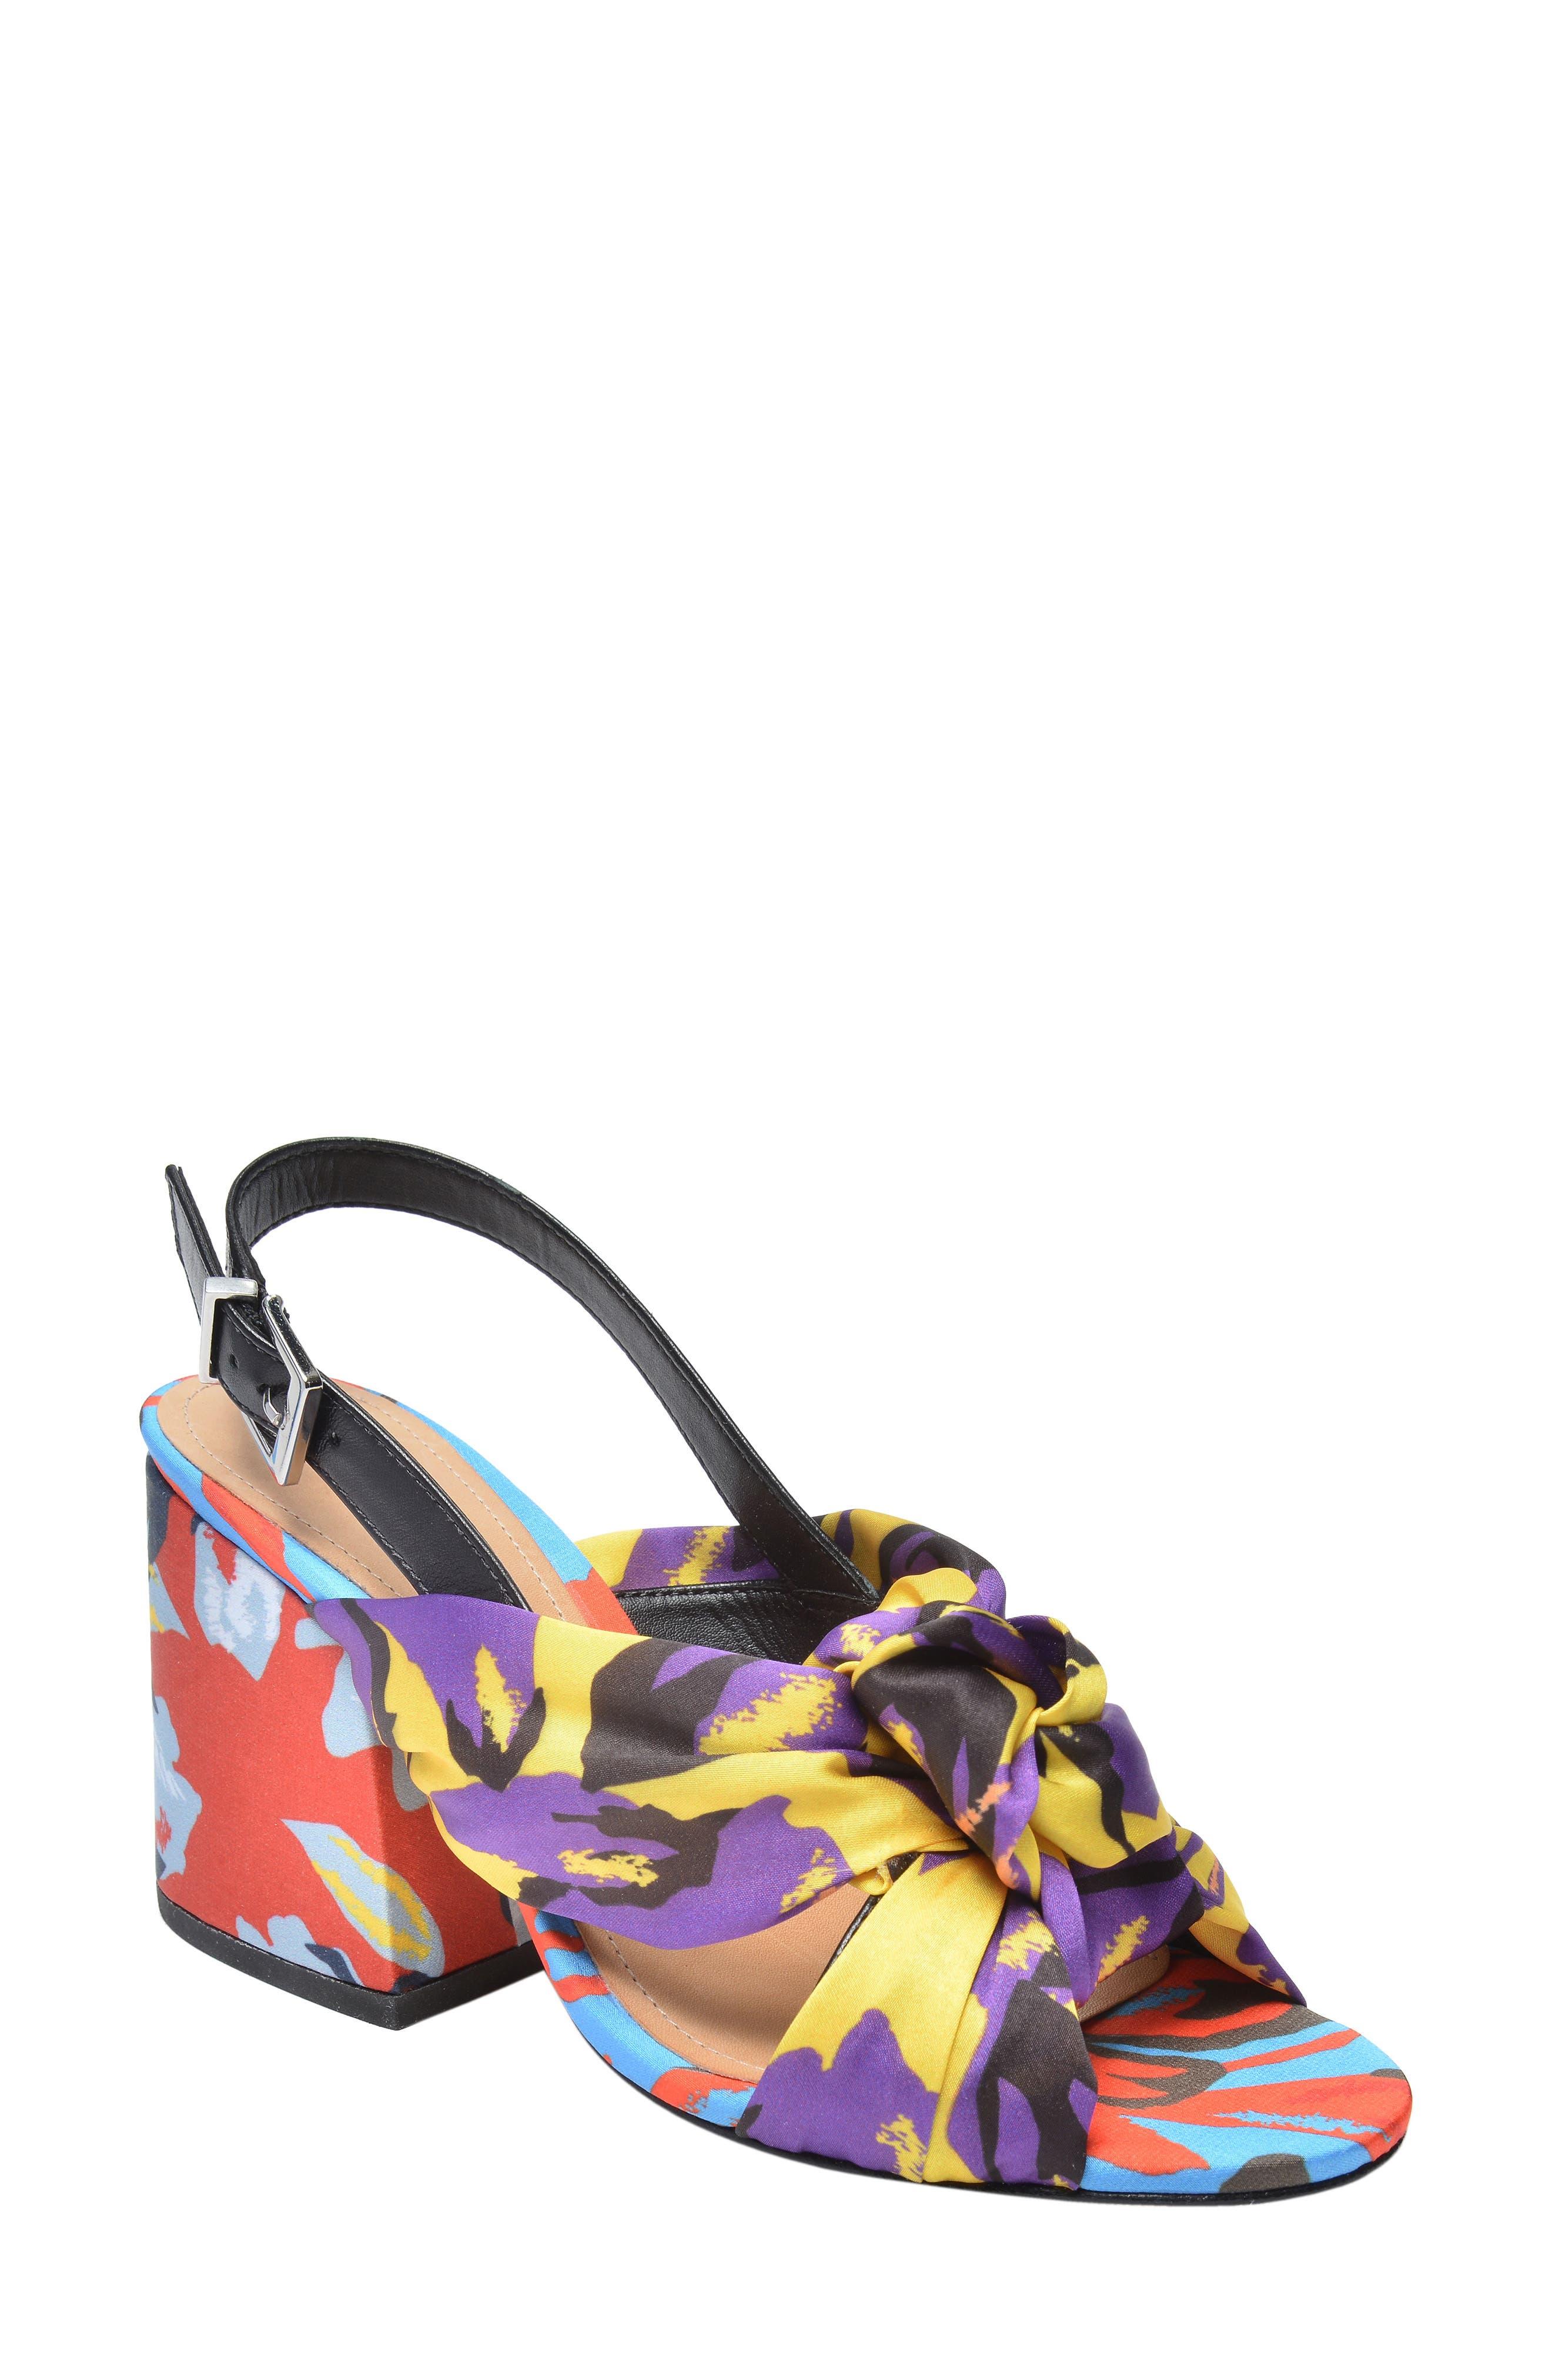 x Adriana Lima Sandal,                         Main,                         color, Floral Print Fabric